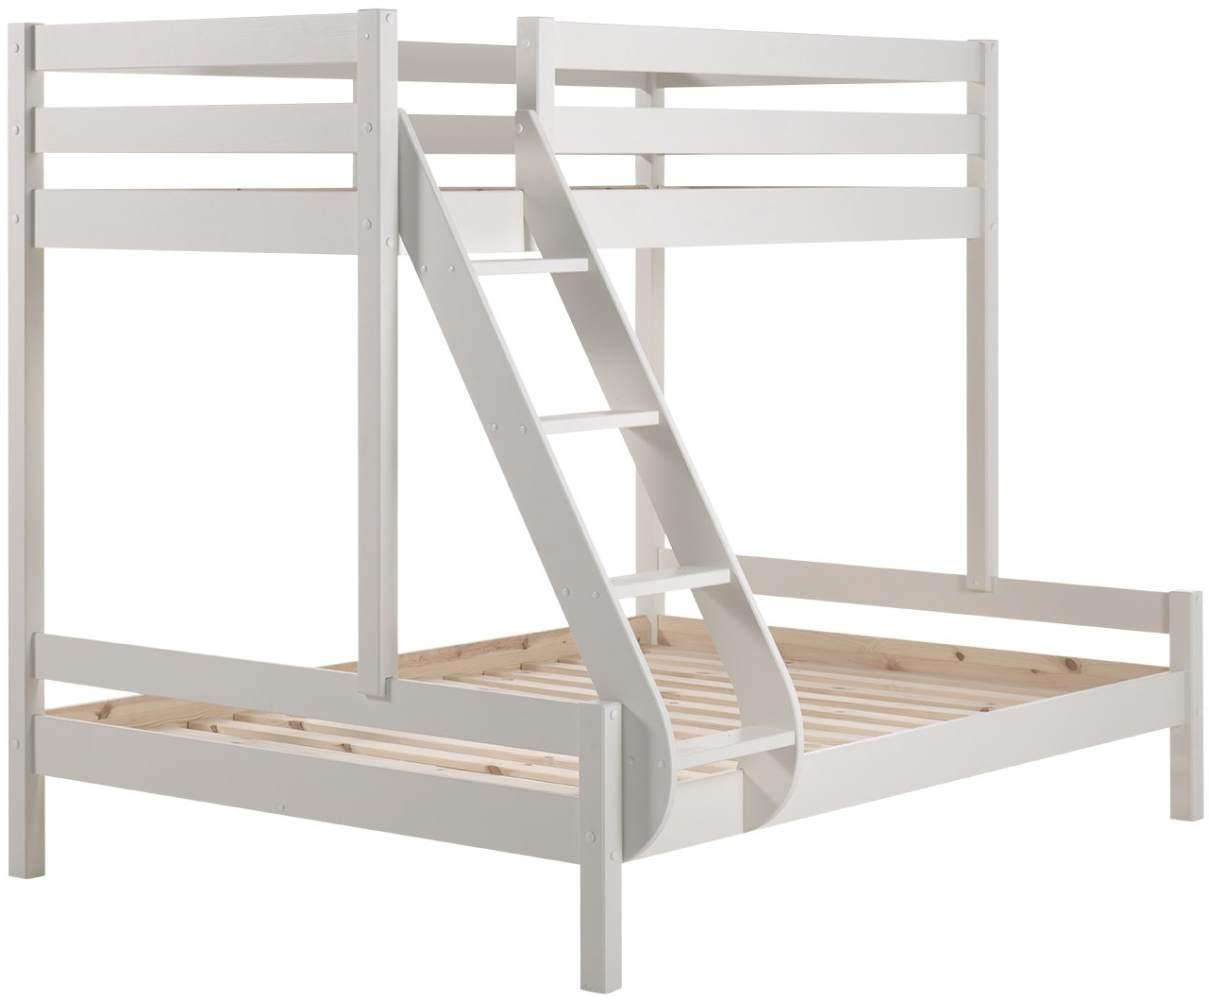 Vipack 'Martin' Etagenbett, weiß, 90x200/140x200 cm, Kiefer massiv, inkl. Lattenroste Bild 1